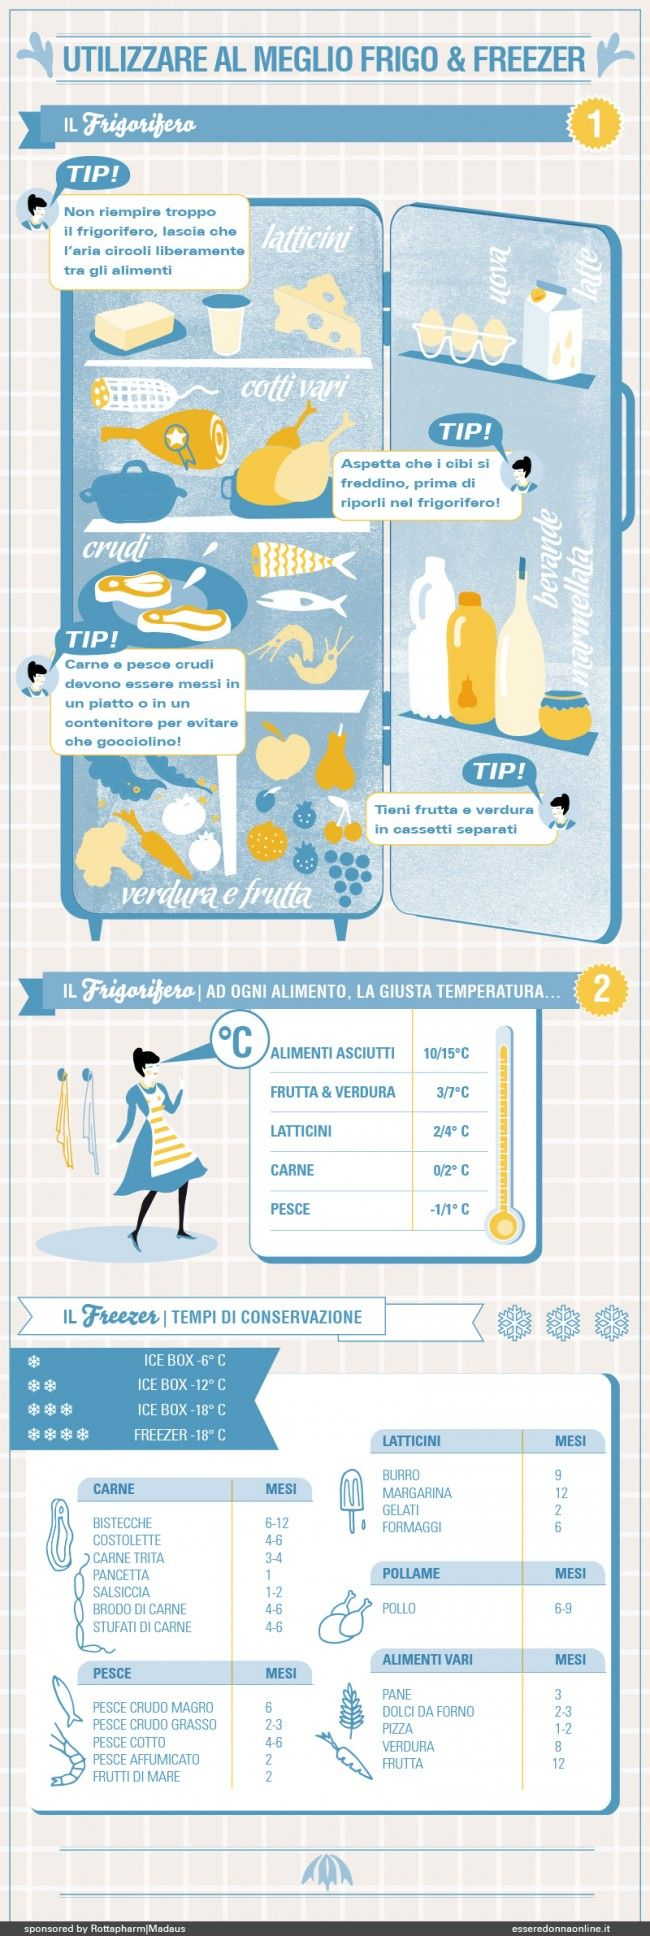 Utilizzare al meglio frigo & freezer - Silvia Gherra per Esseredonnaonline